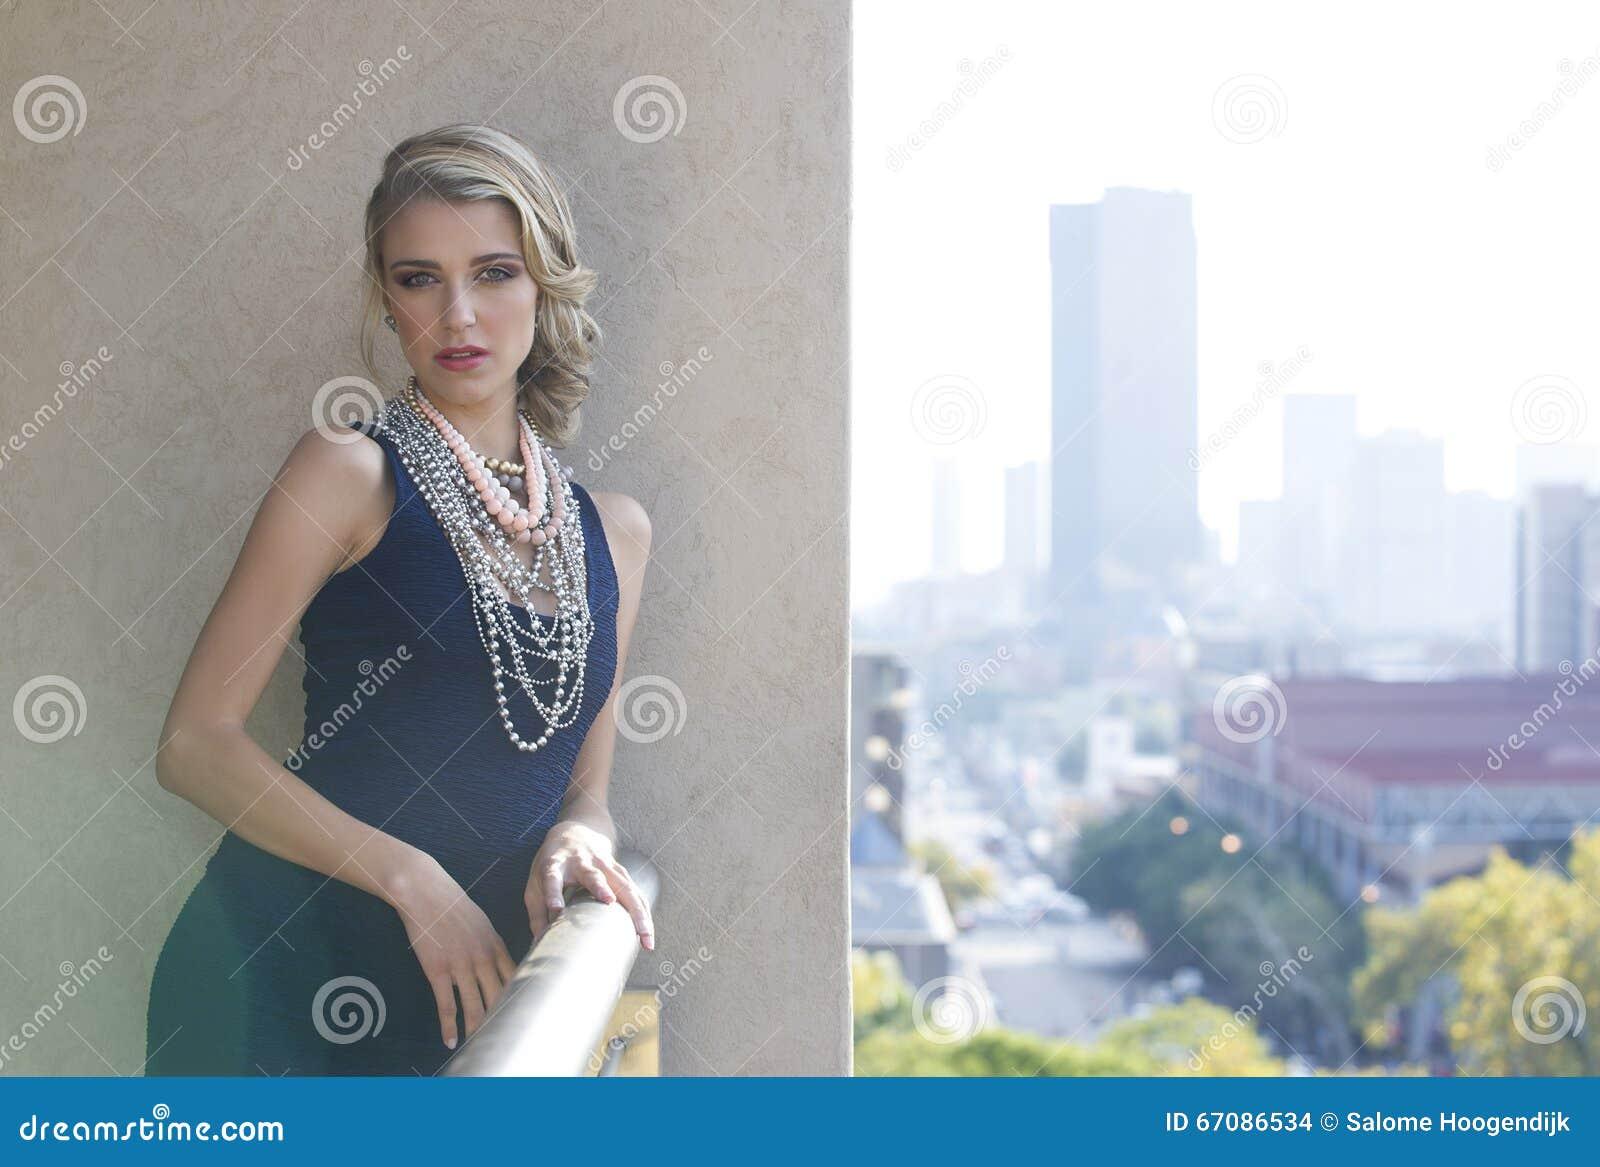 3e970f639dda Το πορτρέτο στο χρώμα μιας όμορφης νέας ξανθής γυναίκας που φορά ένα φόρεμα  ναυτικών